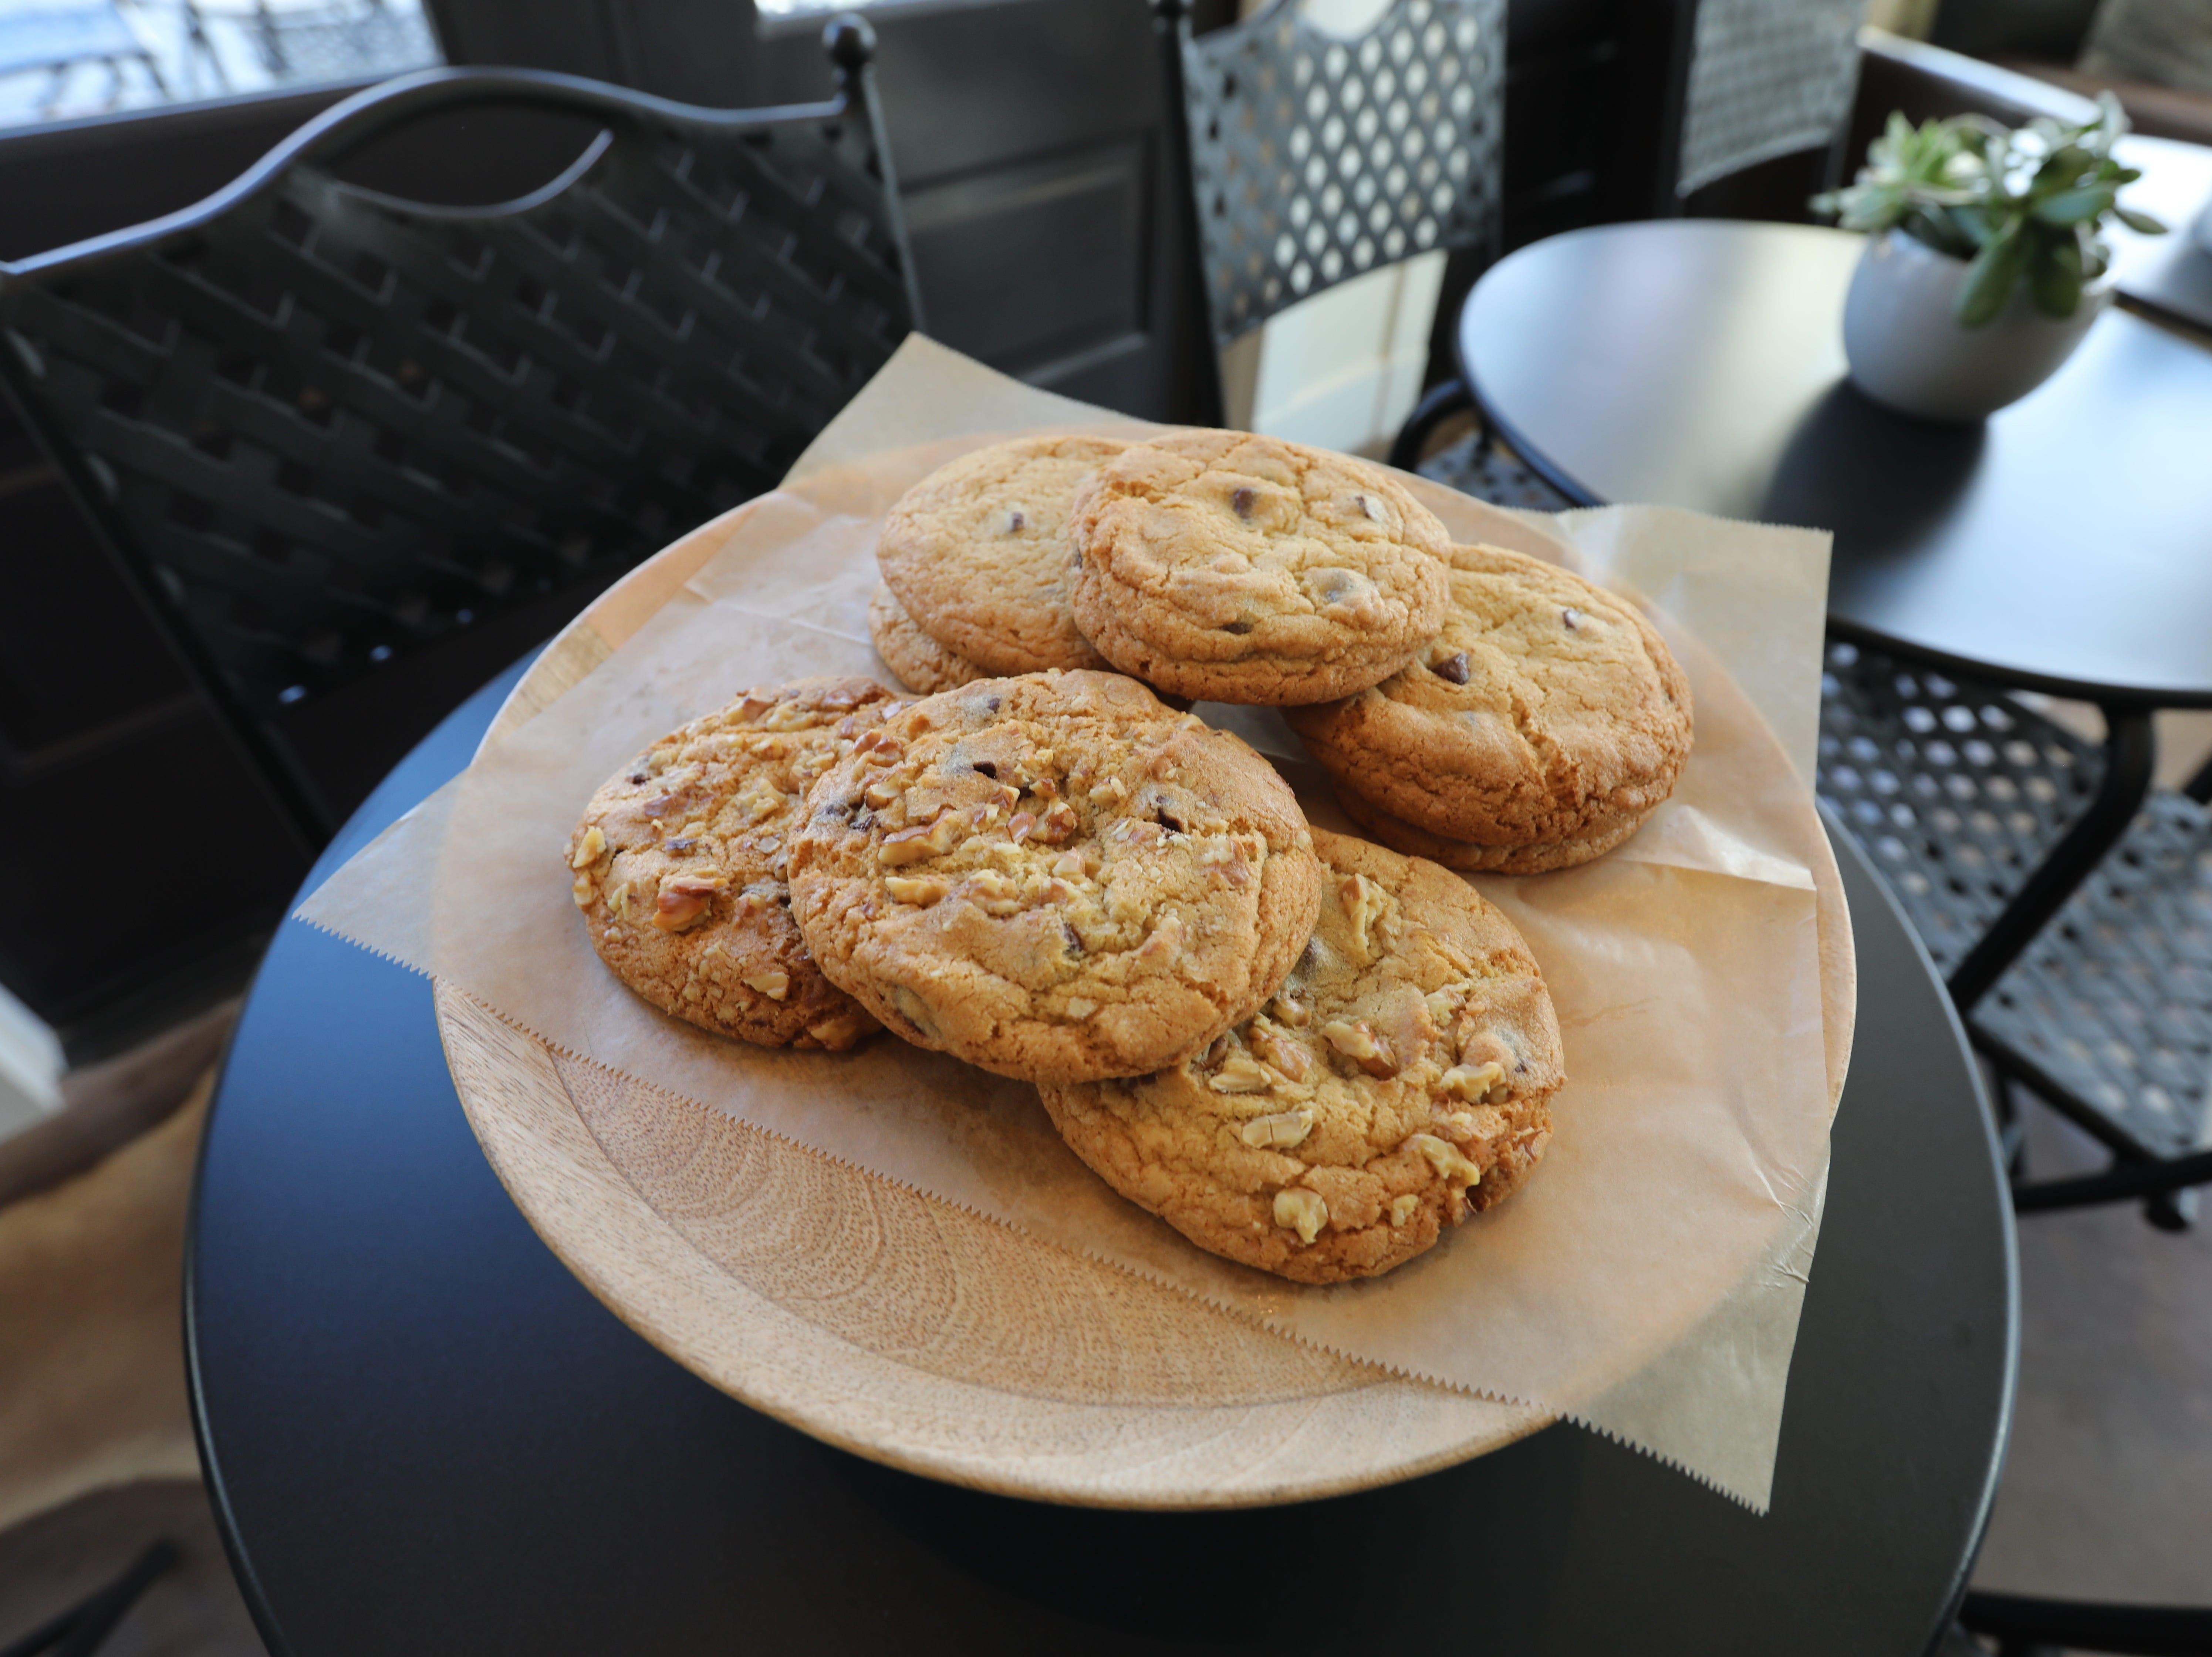 Cookies at he Village Blend Cafe in Sloatsburg Nov. 8, 2018.